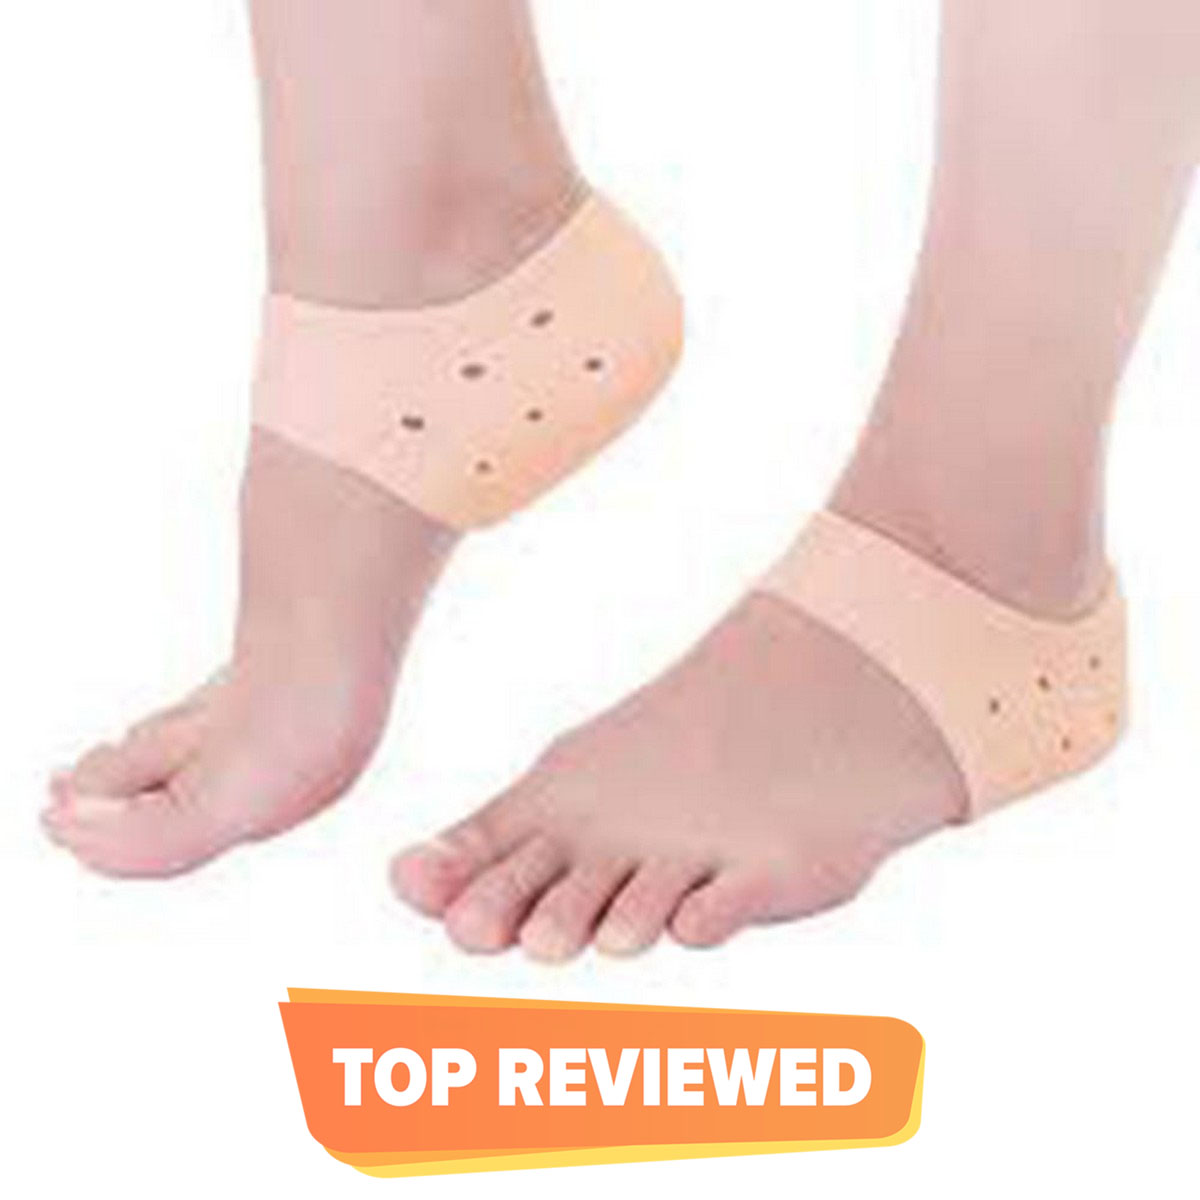 1 Pair (2PCS) Silicone Gel Heel Crack Protector Anti Crack Moisturizing Foot Pain Care Leg Pain Relief Heel Socks Tumit Sakit Non-Slip Silicone Sock (Human Skin Color)